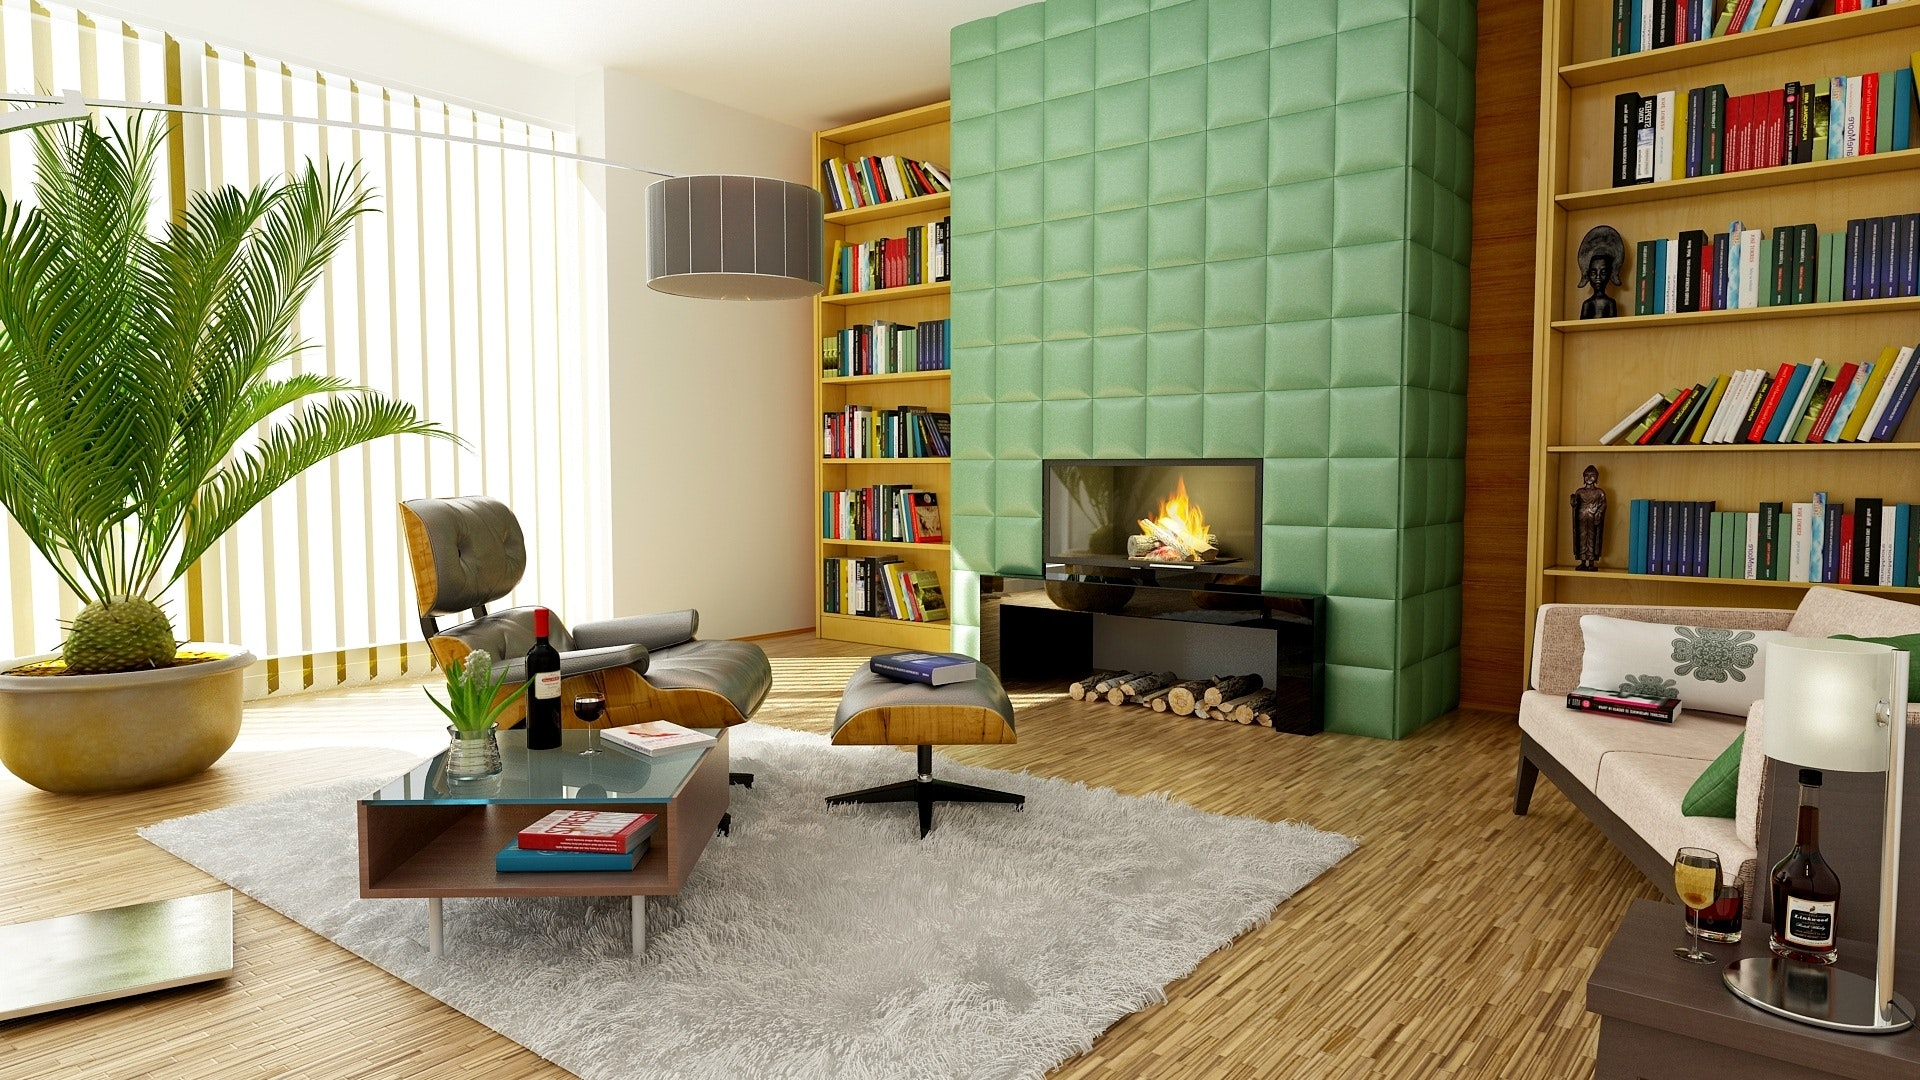 1000 Beautiful Living Room Photos  Pexels  Free Stock